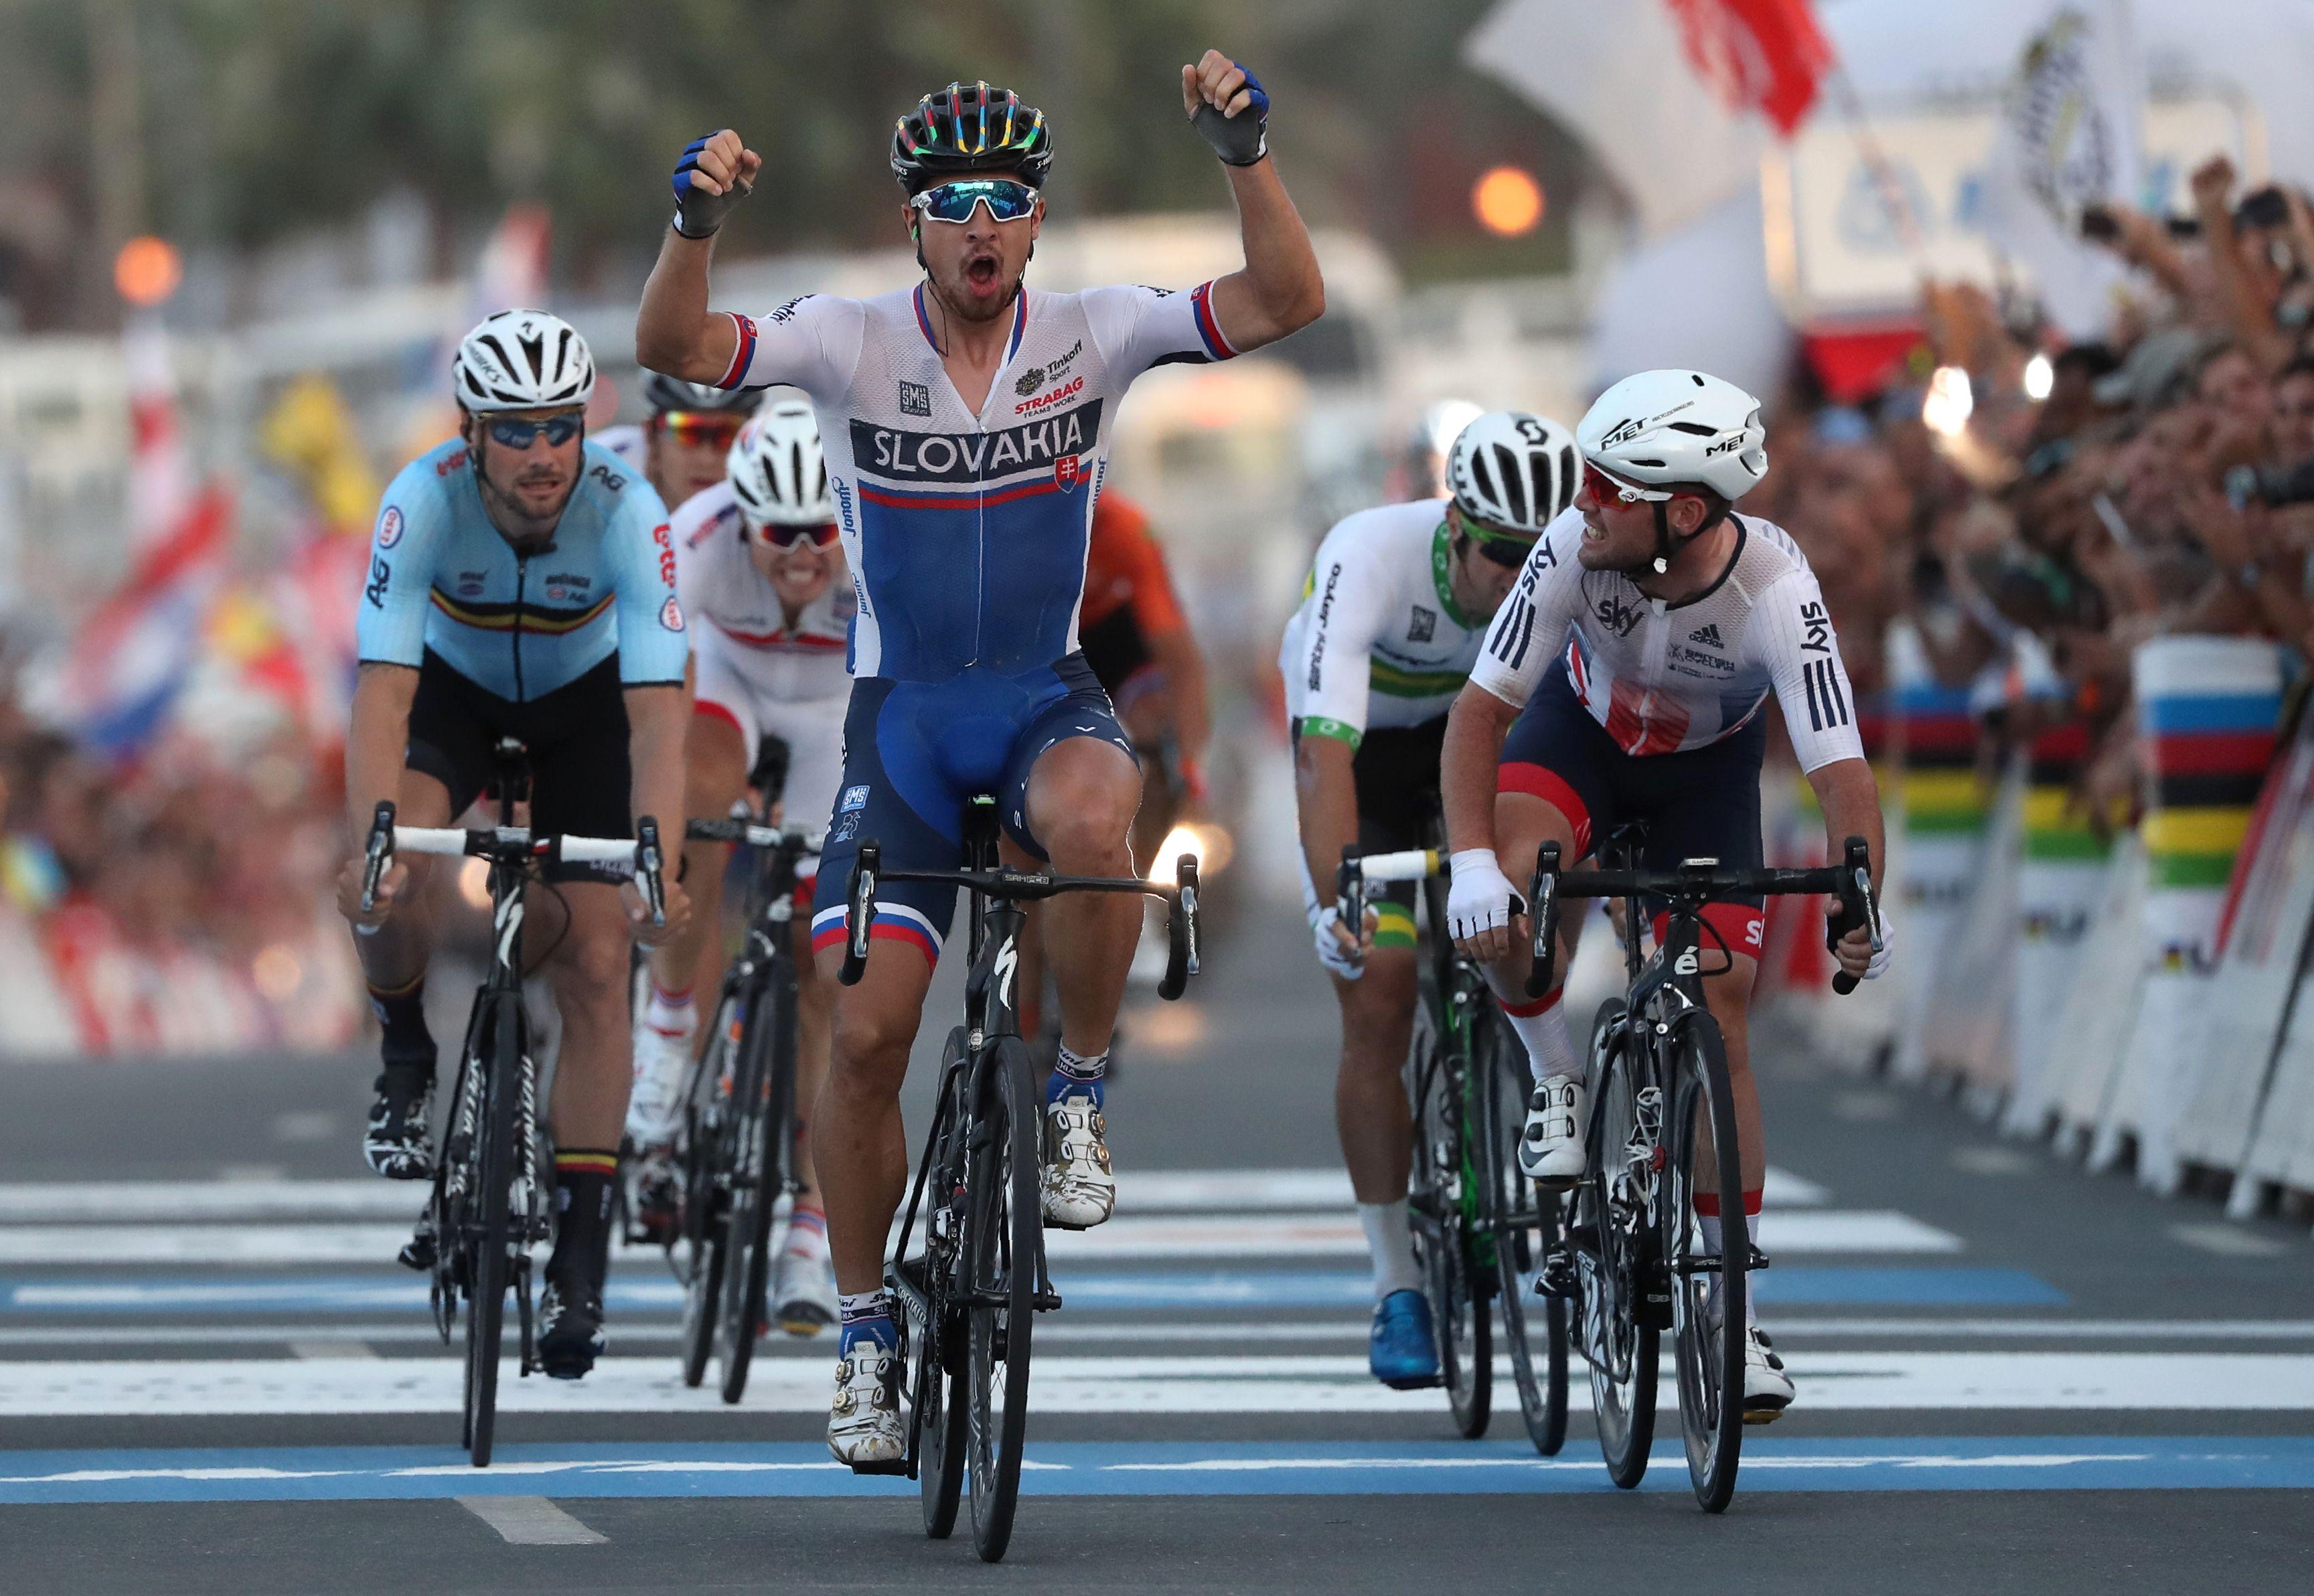 Cyclisme - Peter Sagan garde sa couronne dans le désert qatari